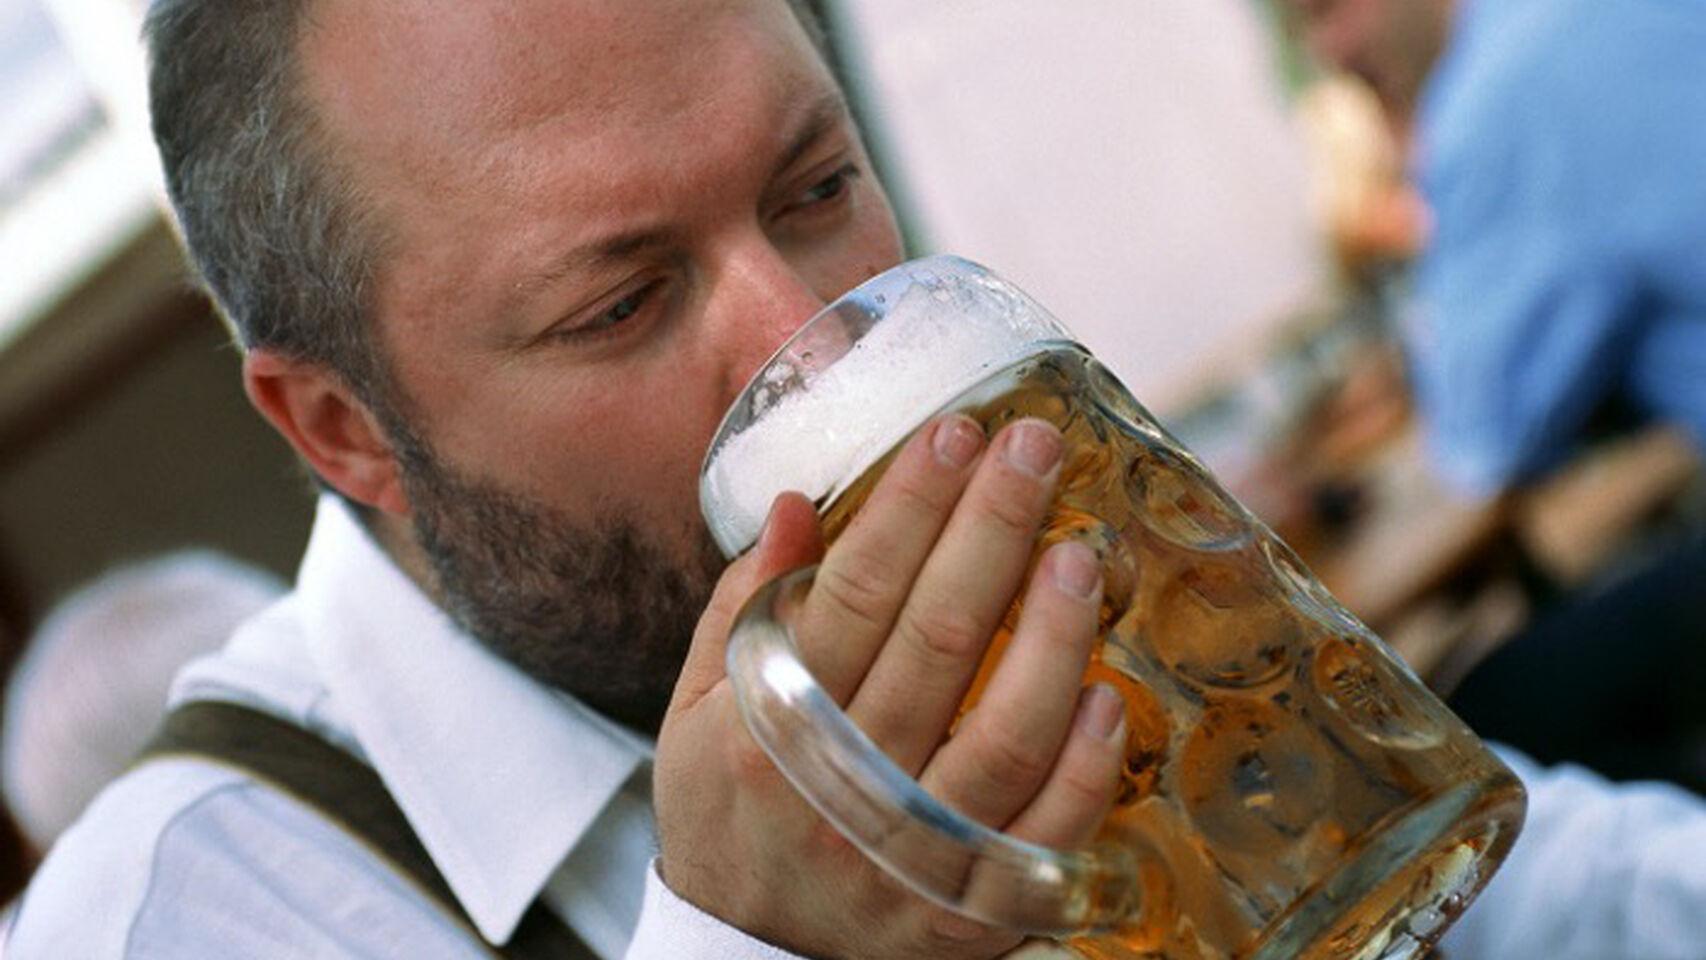 Alcohol-Alcoholismo-Adelgazamiento-Nutricion_478963265_149445680_1706x960